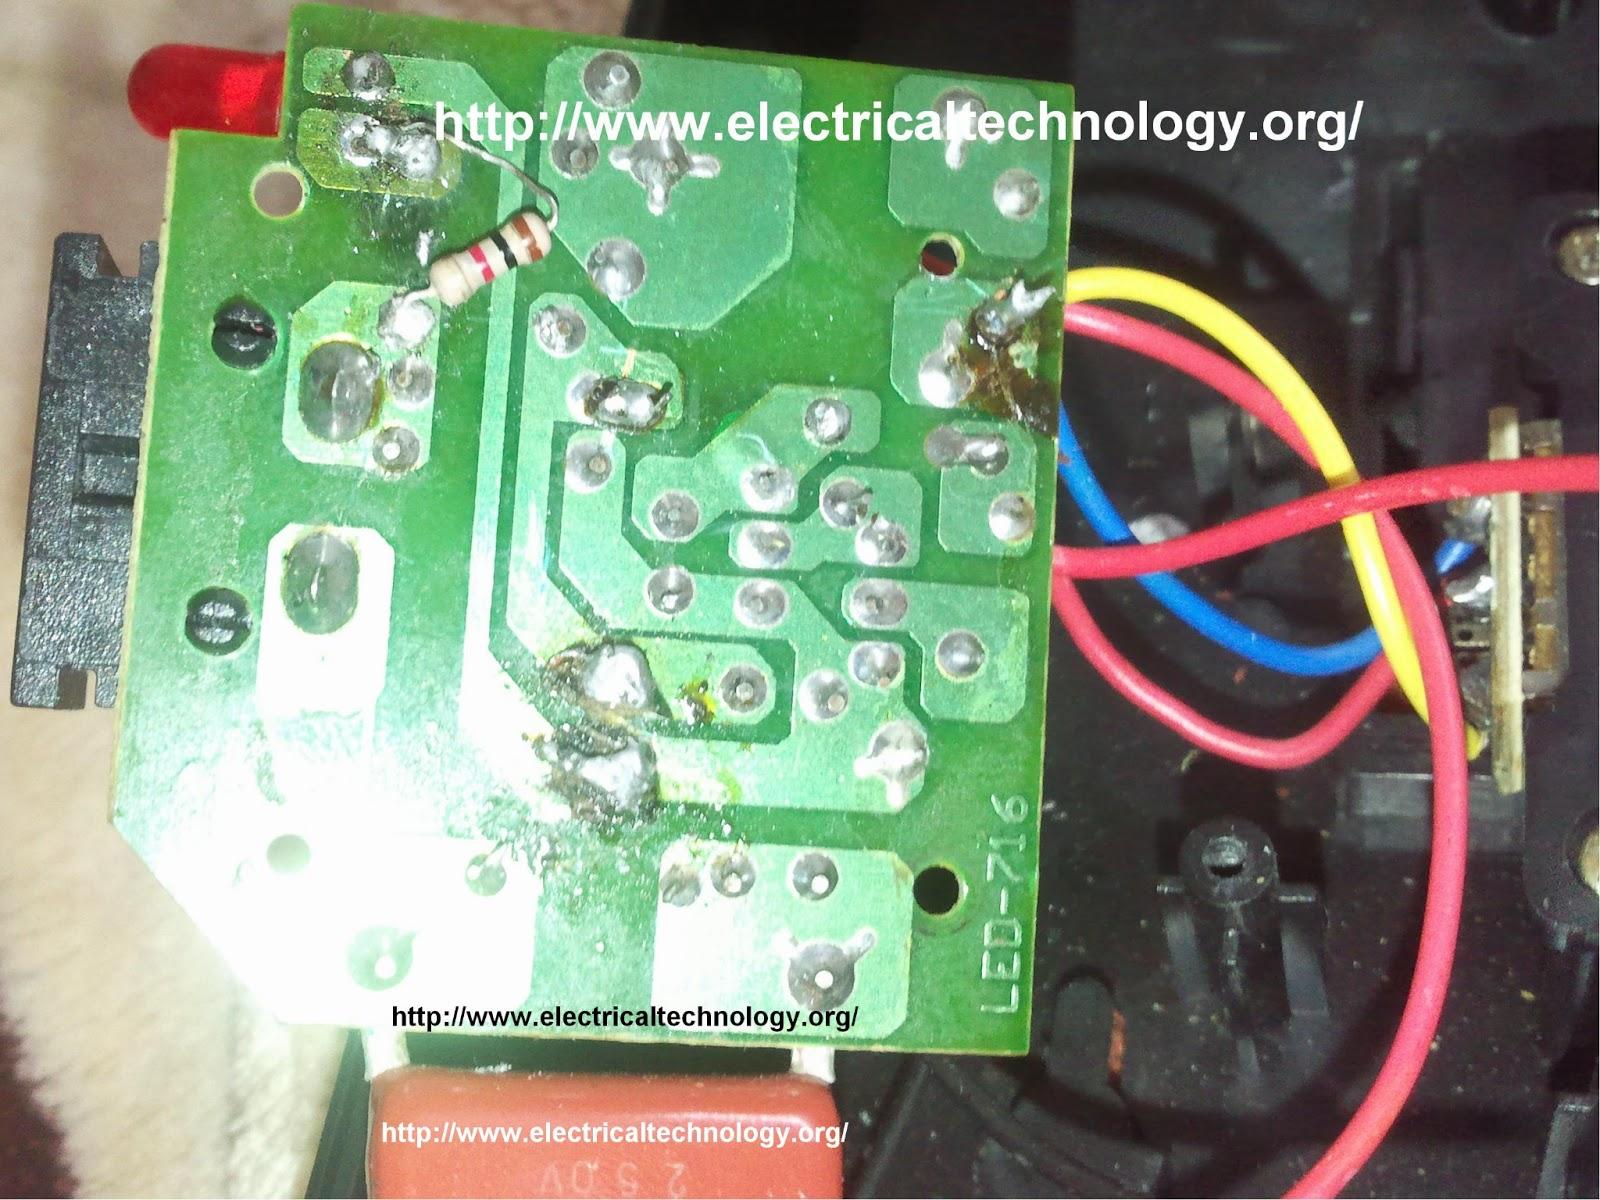 Emergency Power Off Wiring Diagram Http Wwwseekiccom Circuit